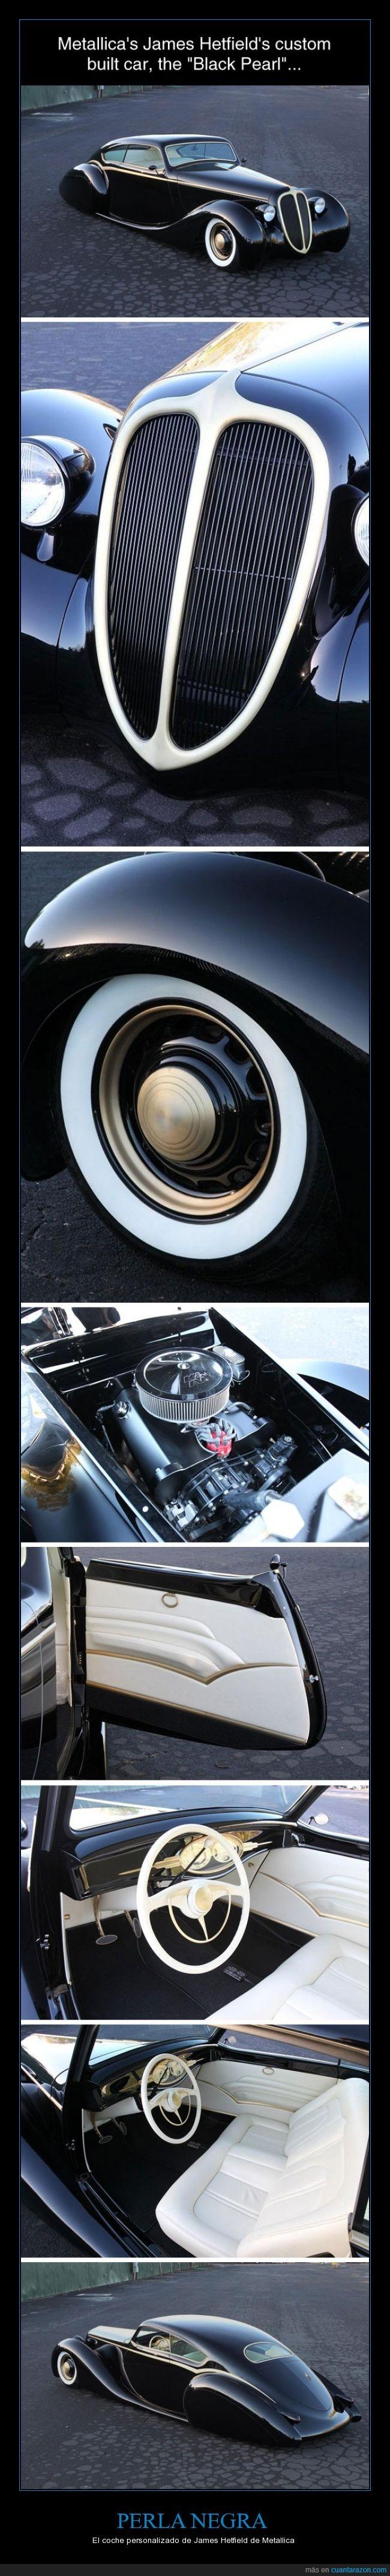 coche,james hetfield,metallica,negro,personalizado